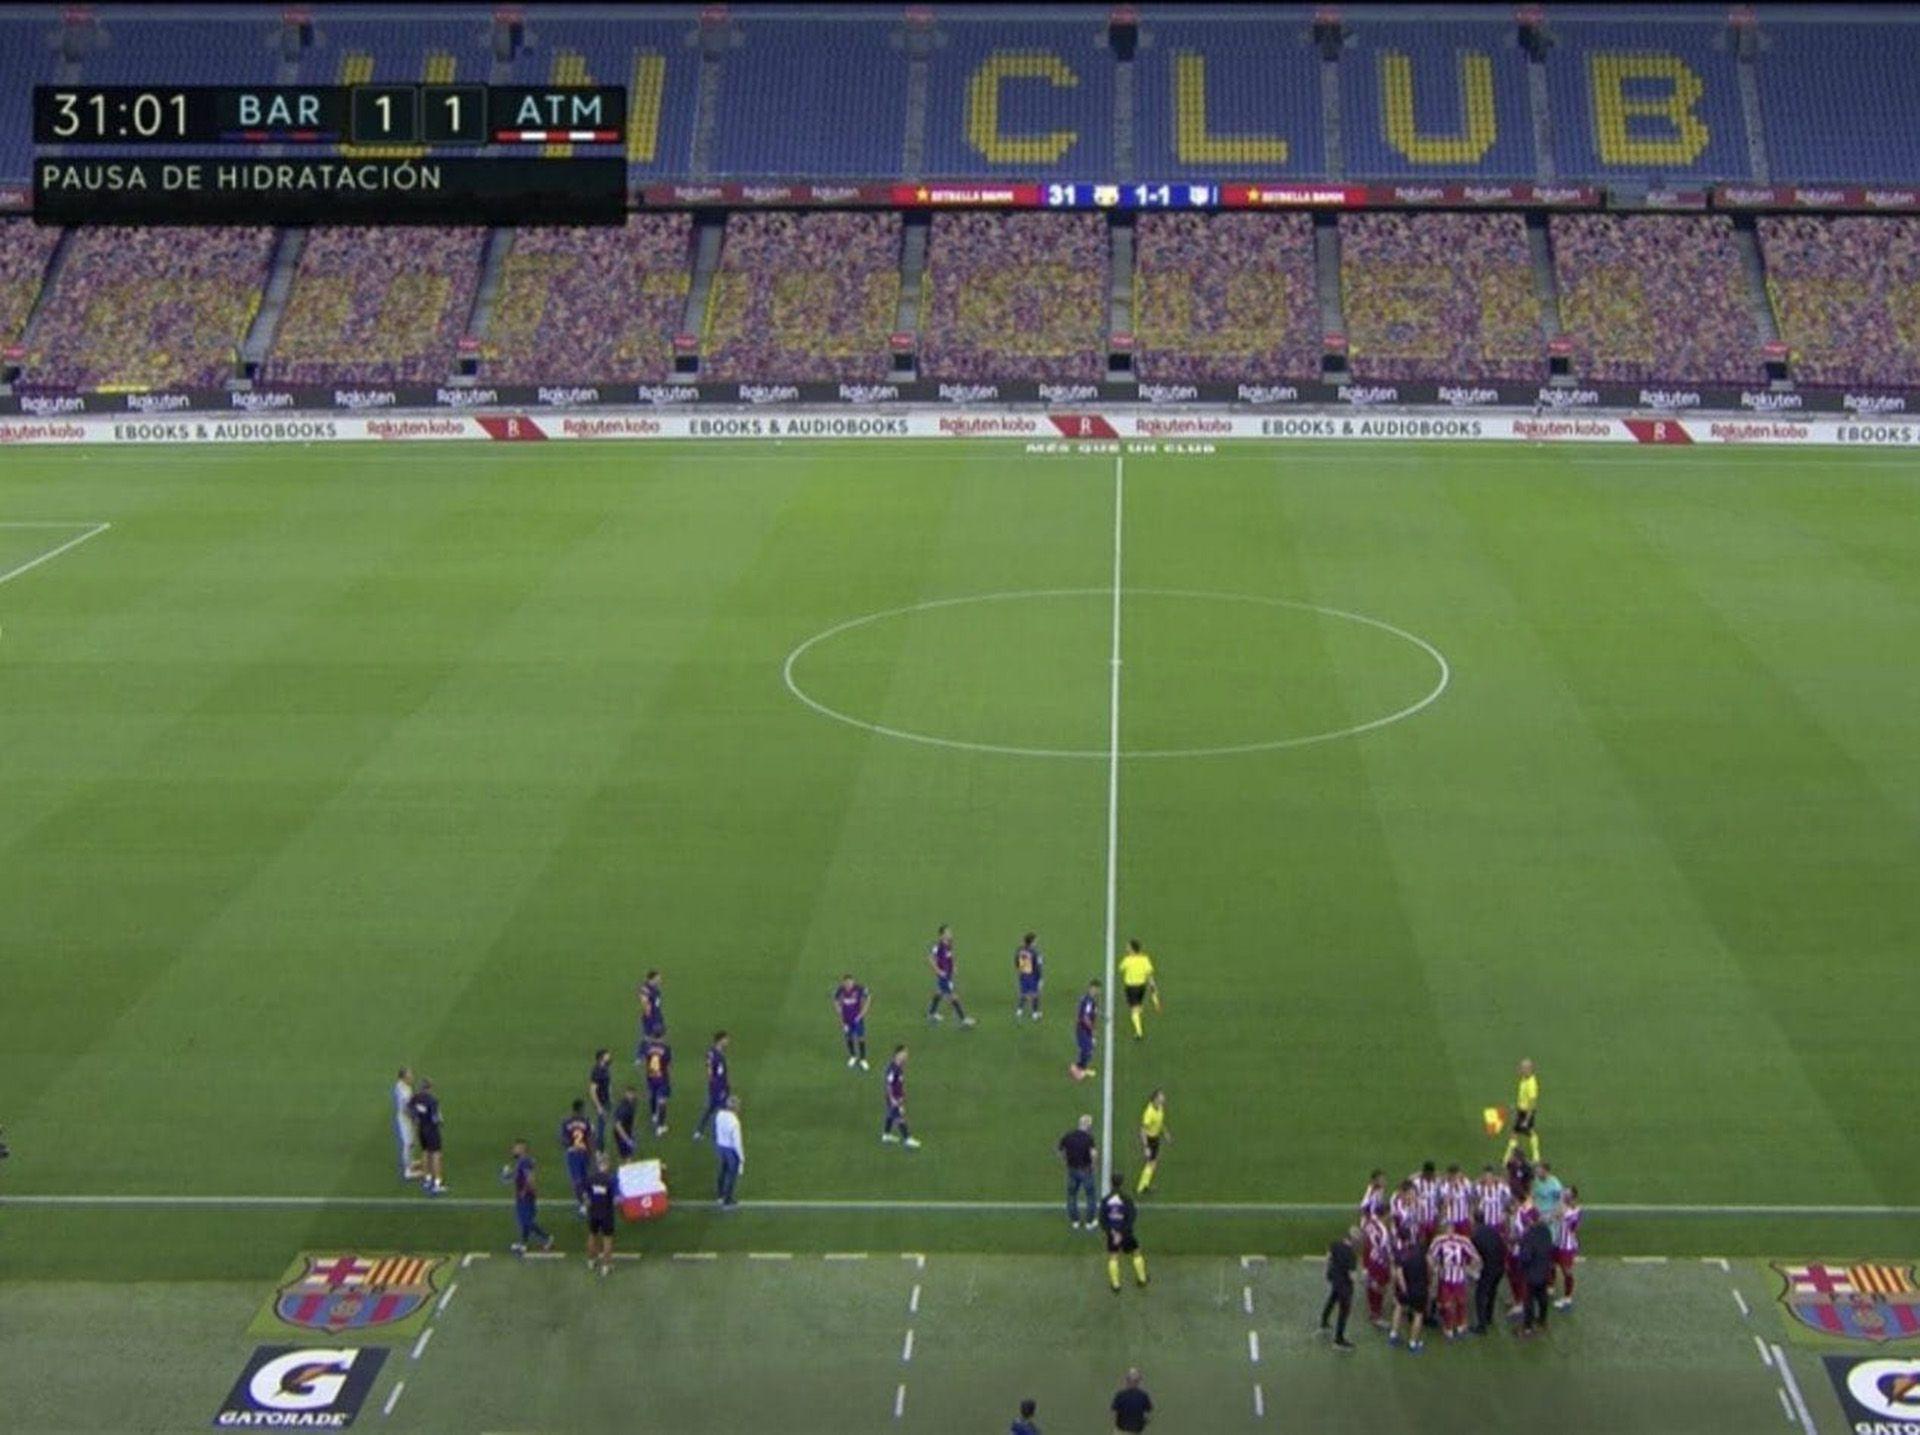 Atlético de Madrid Barcelona